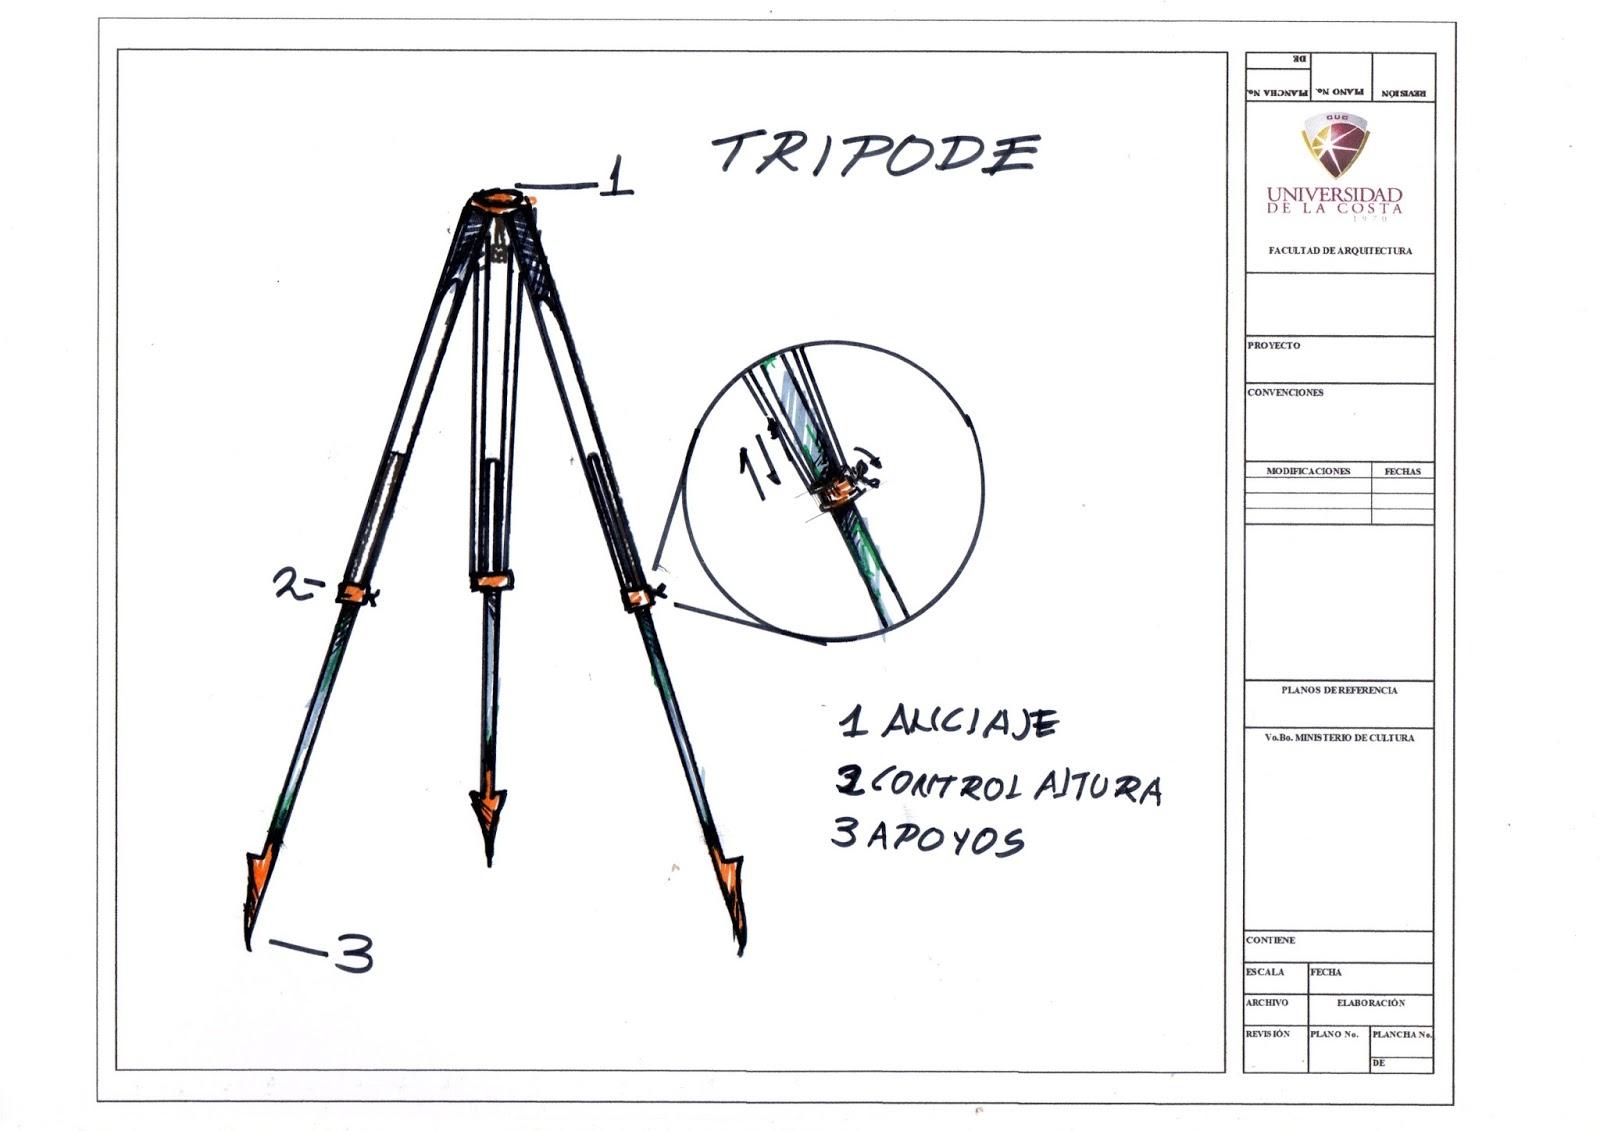 Topografia instrumentos topograficos for Planos topograficos pdf